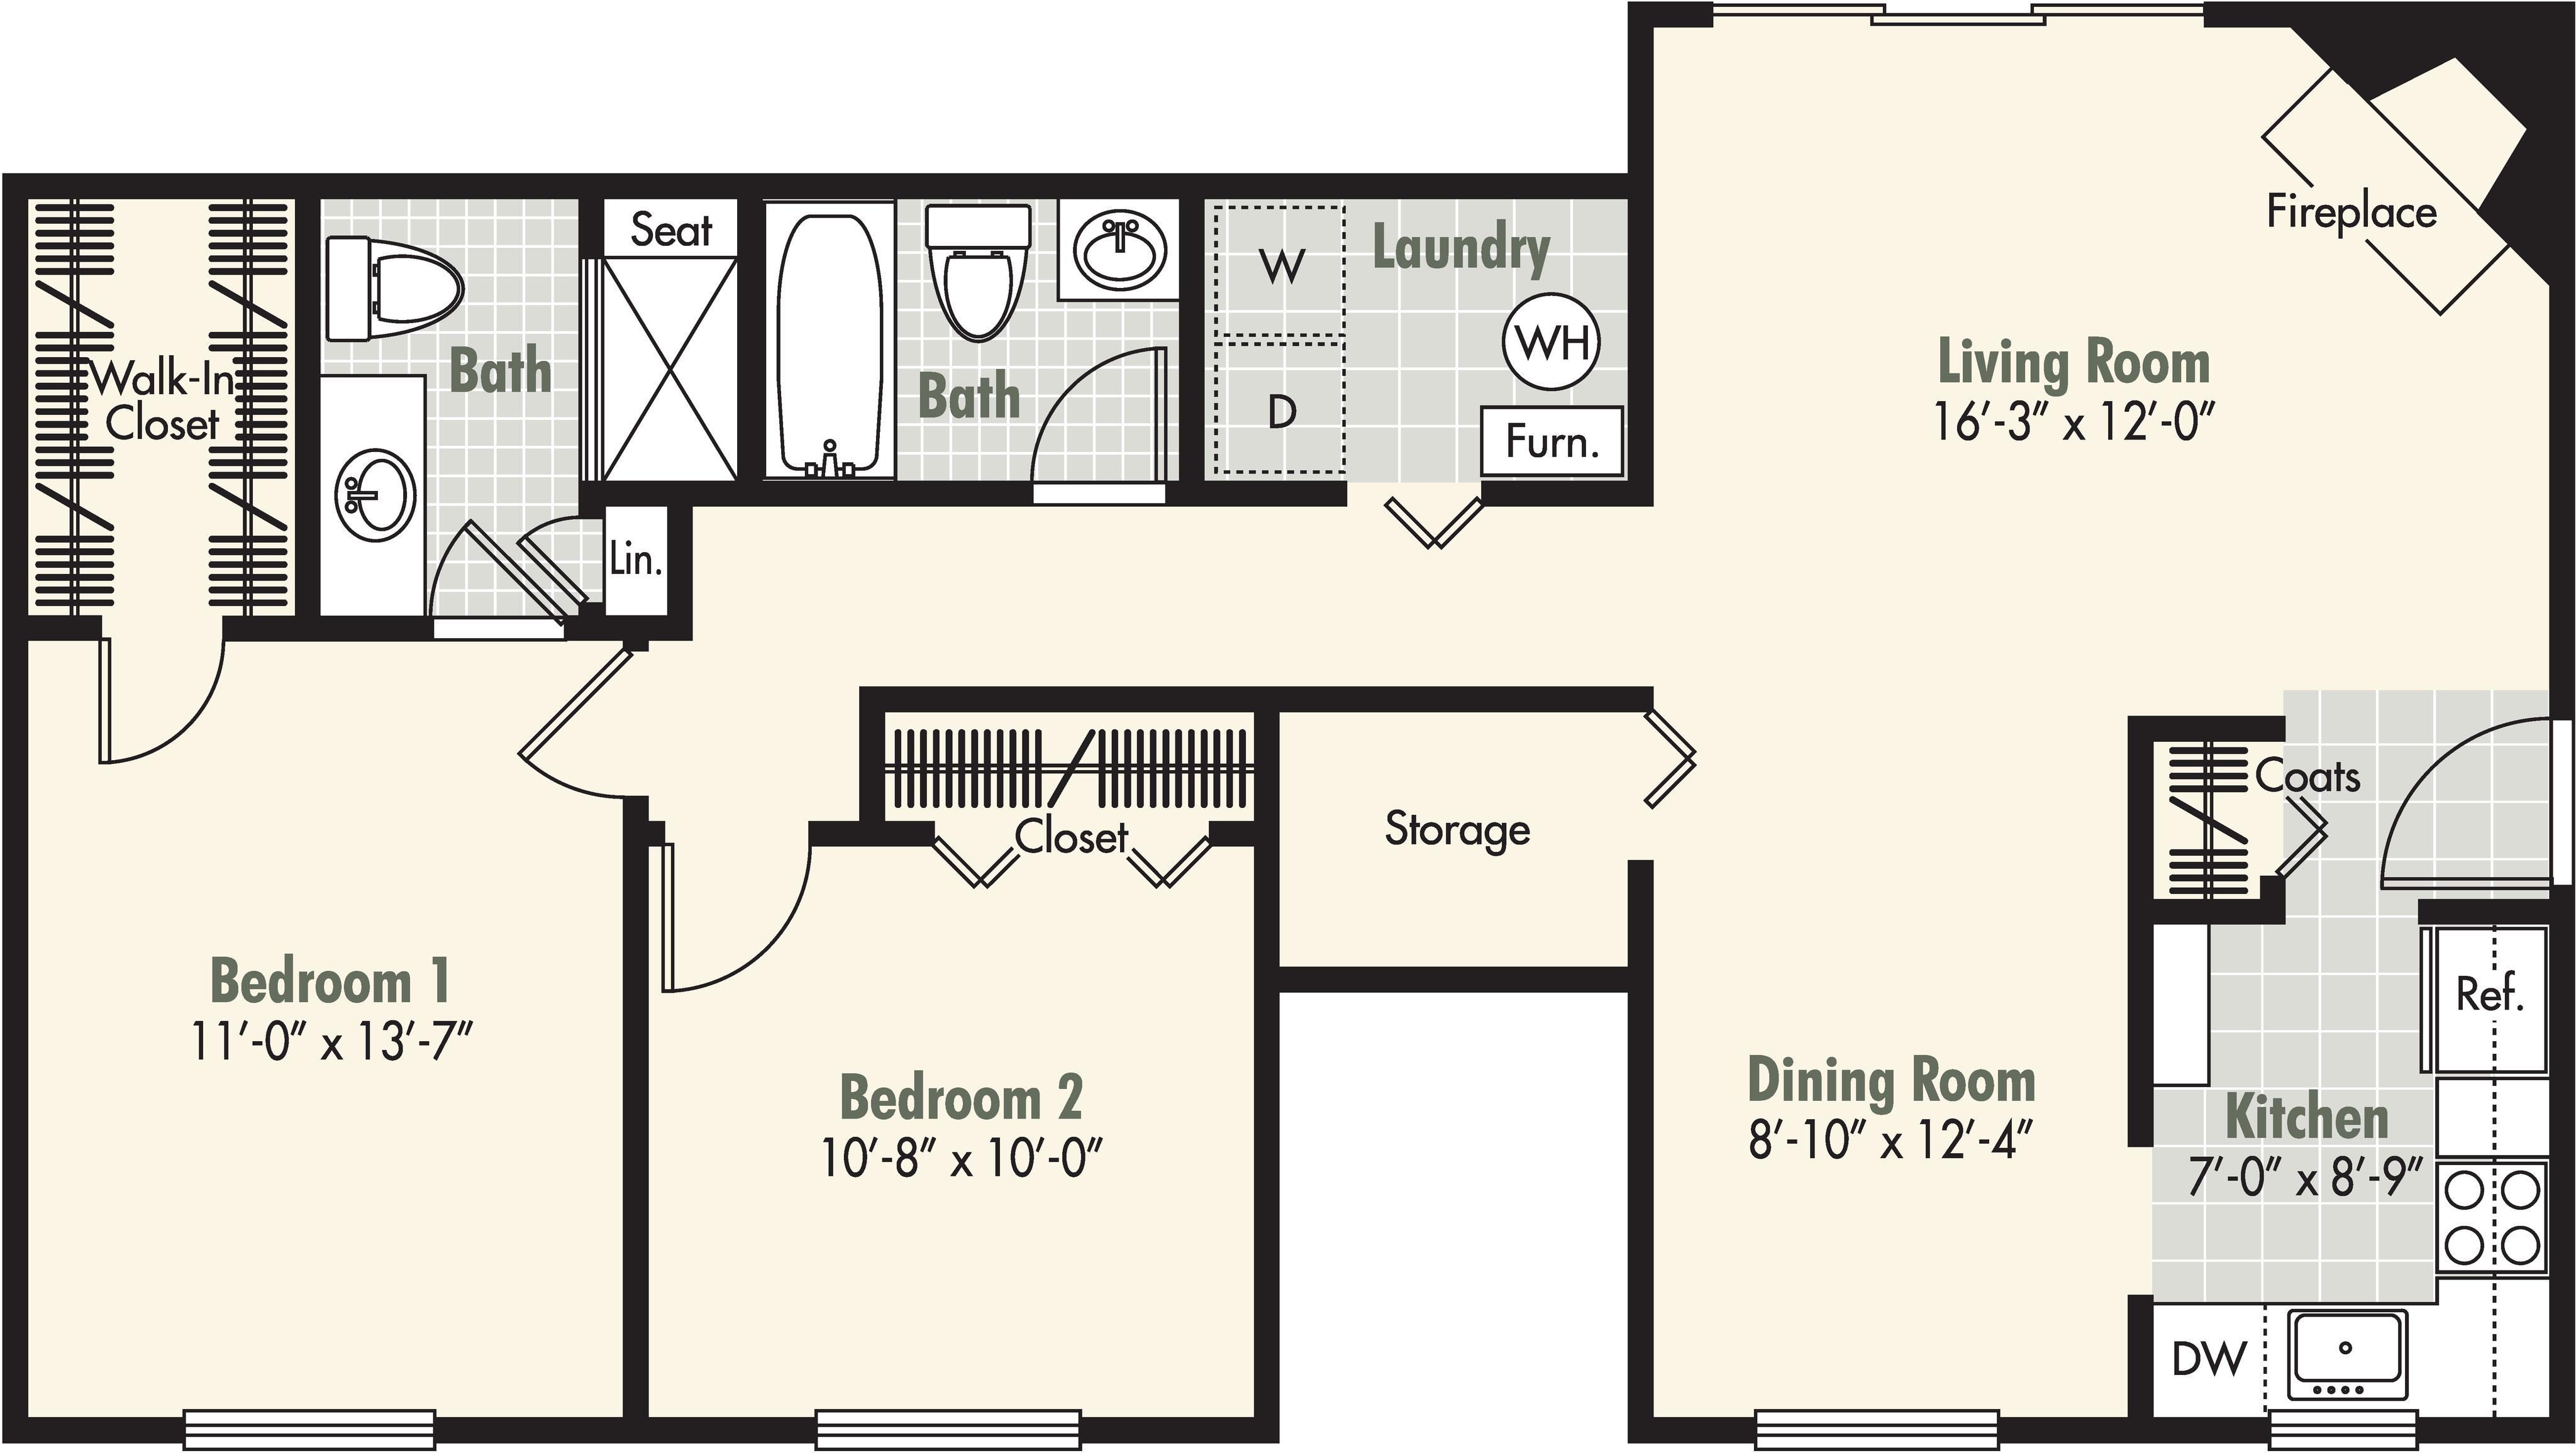 2 Bedroom - 2 Bath